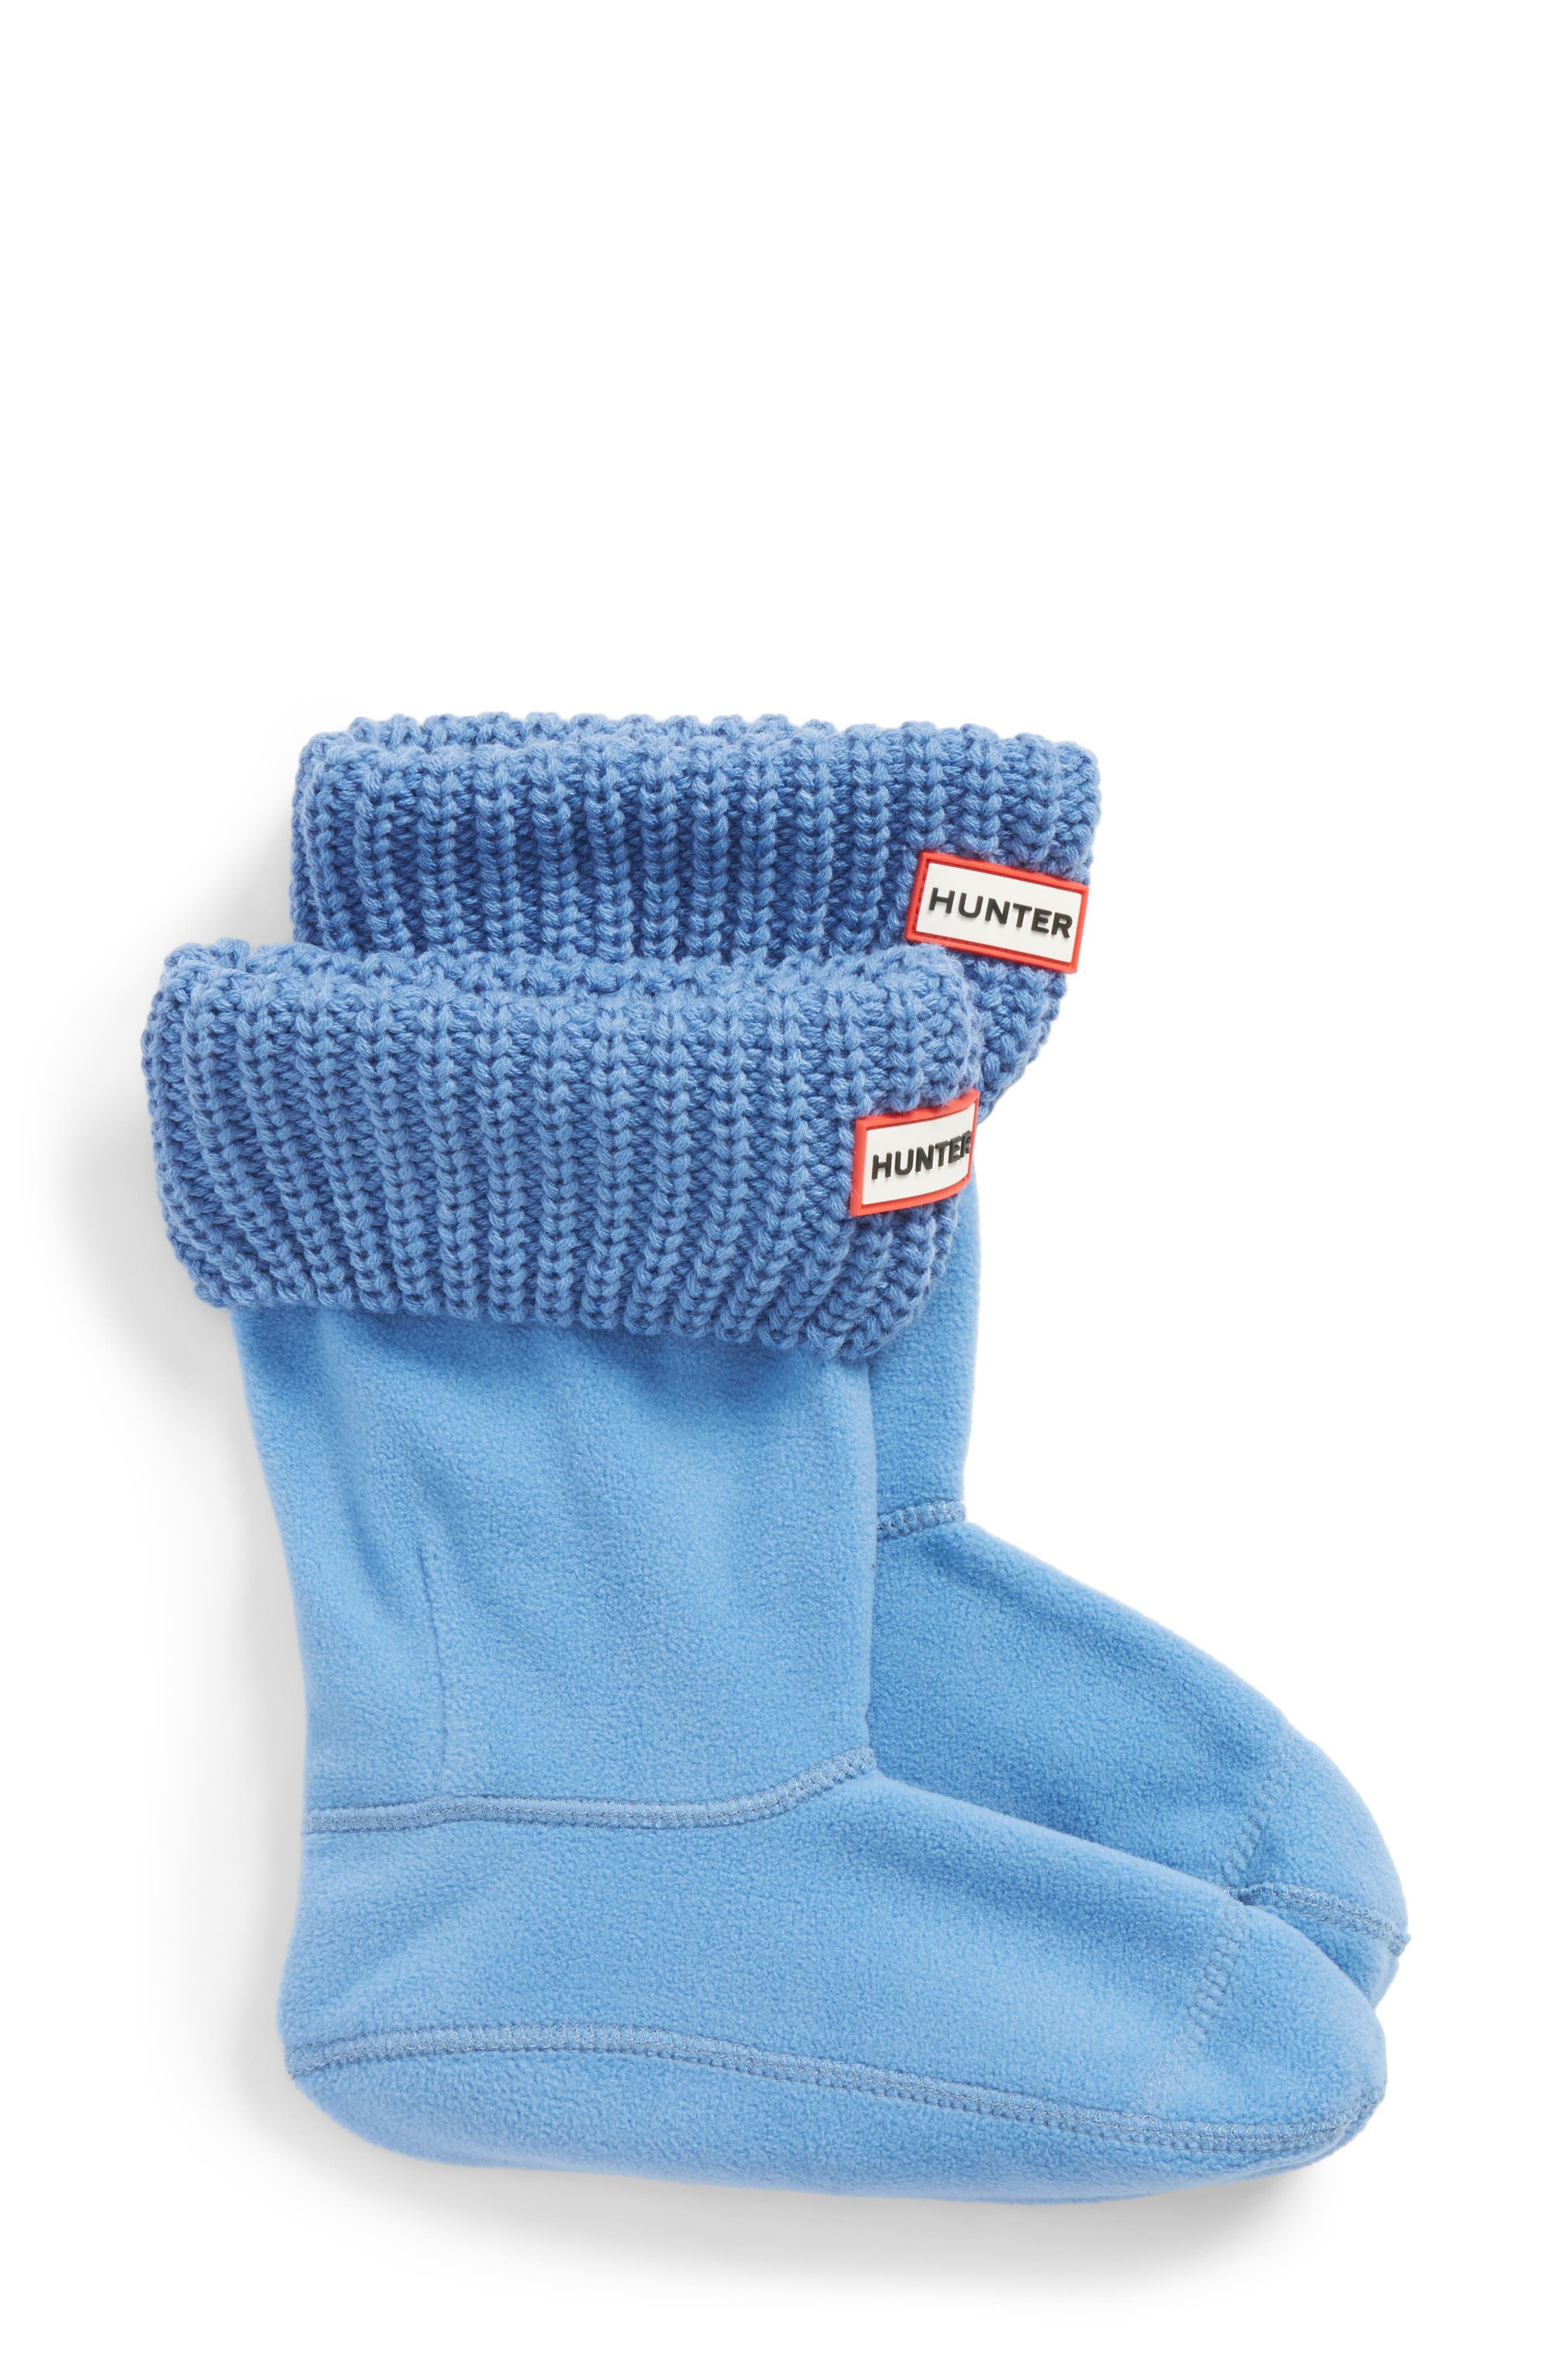 Alternate Image 1 Selected - Hunter 'Half Cardigan' Fleece Boot Socks (Women)